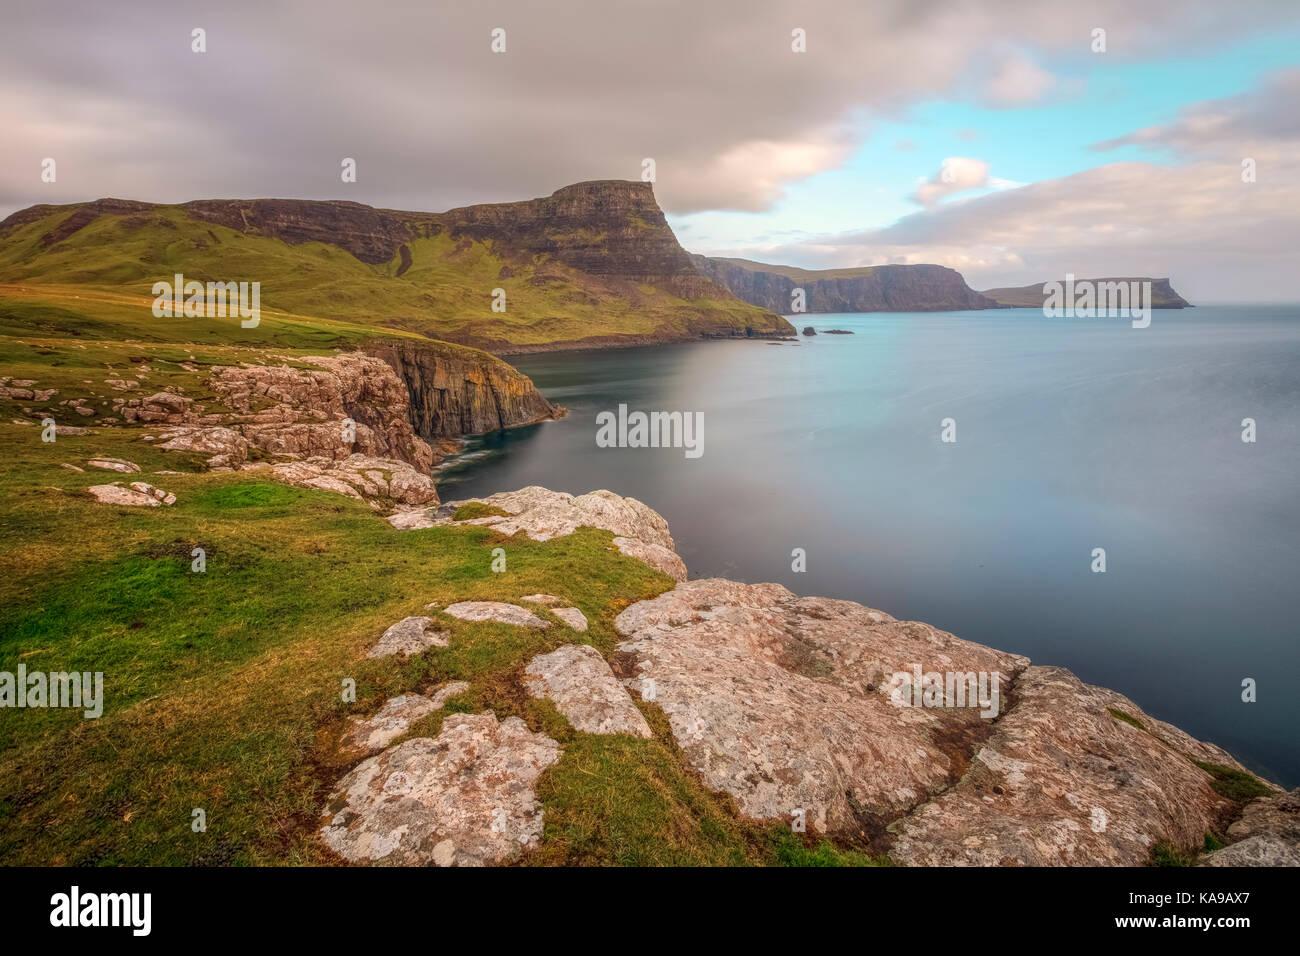 Moonen Bay, Isla de Skye, Escocia, Reino Unido Foto de stock